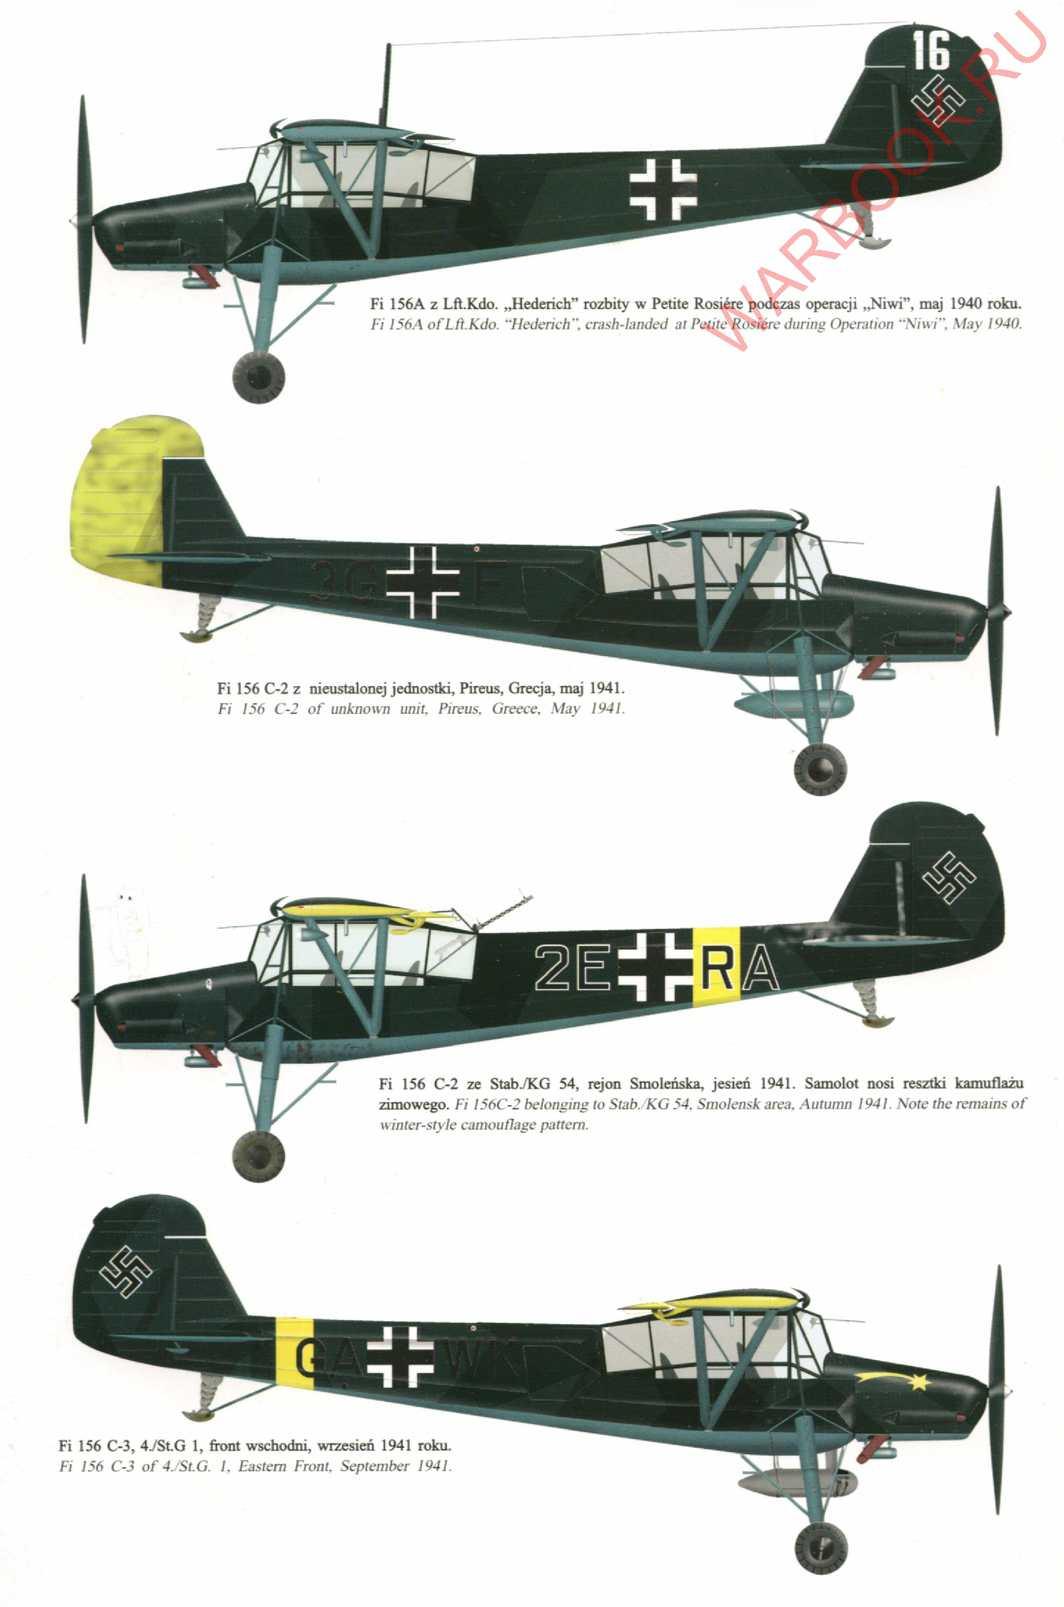 Fieseler Storch Fi 156 P2